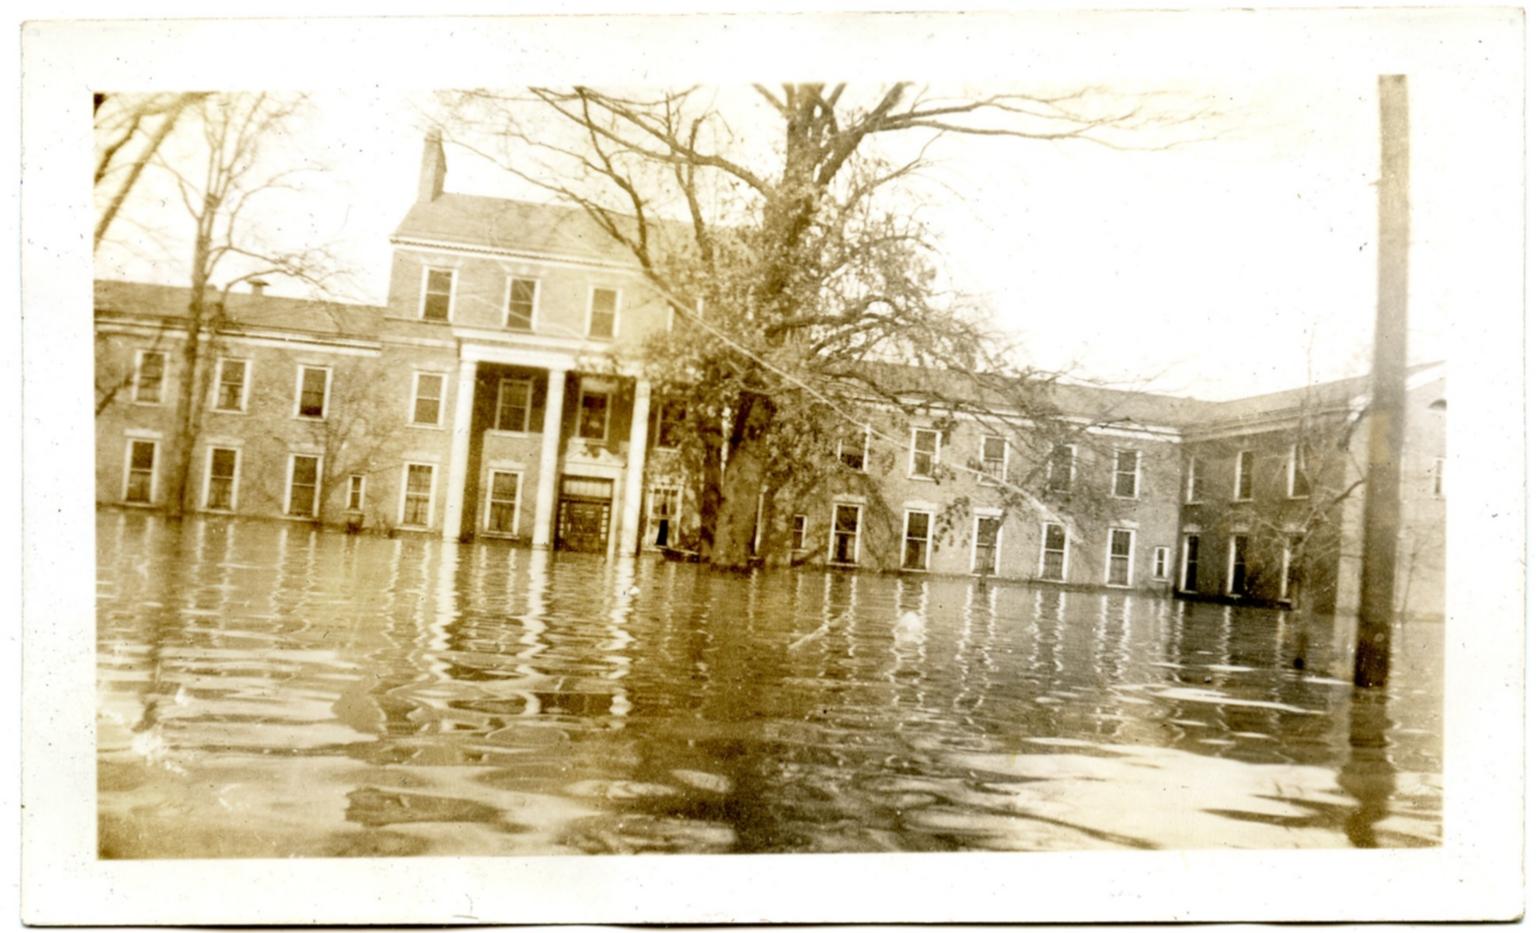 Illinois Central Railroad Hospital during '37 flood.